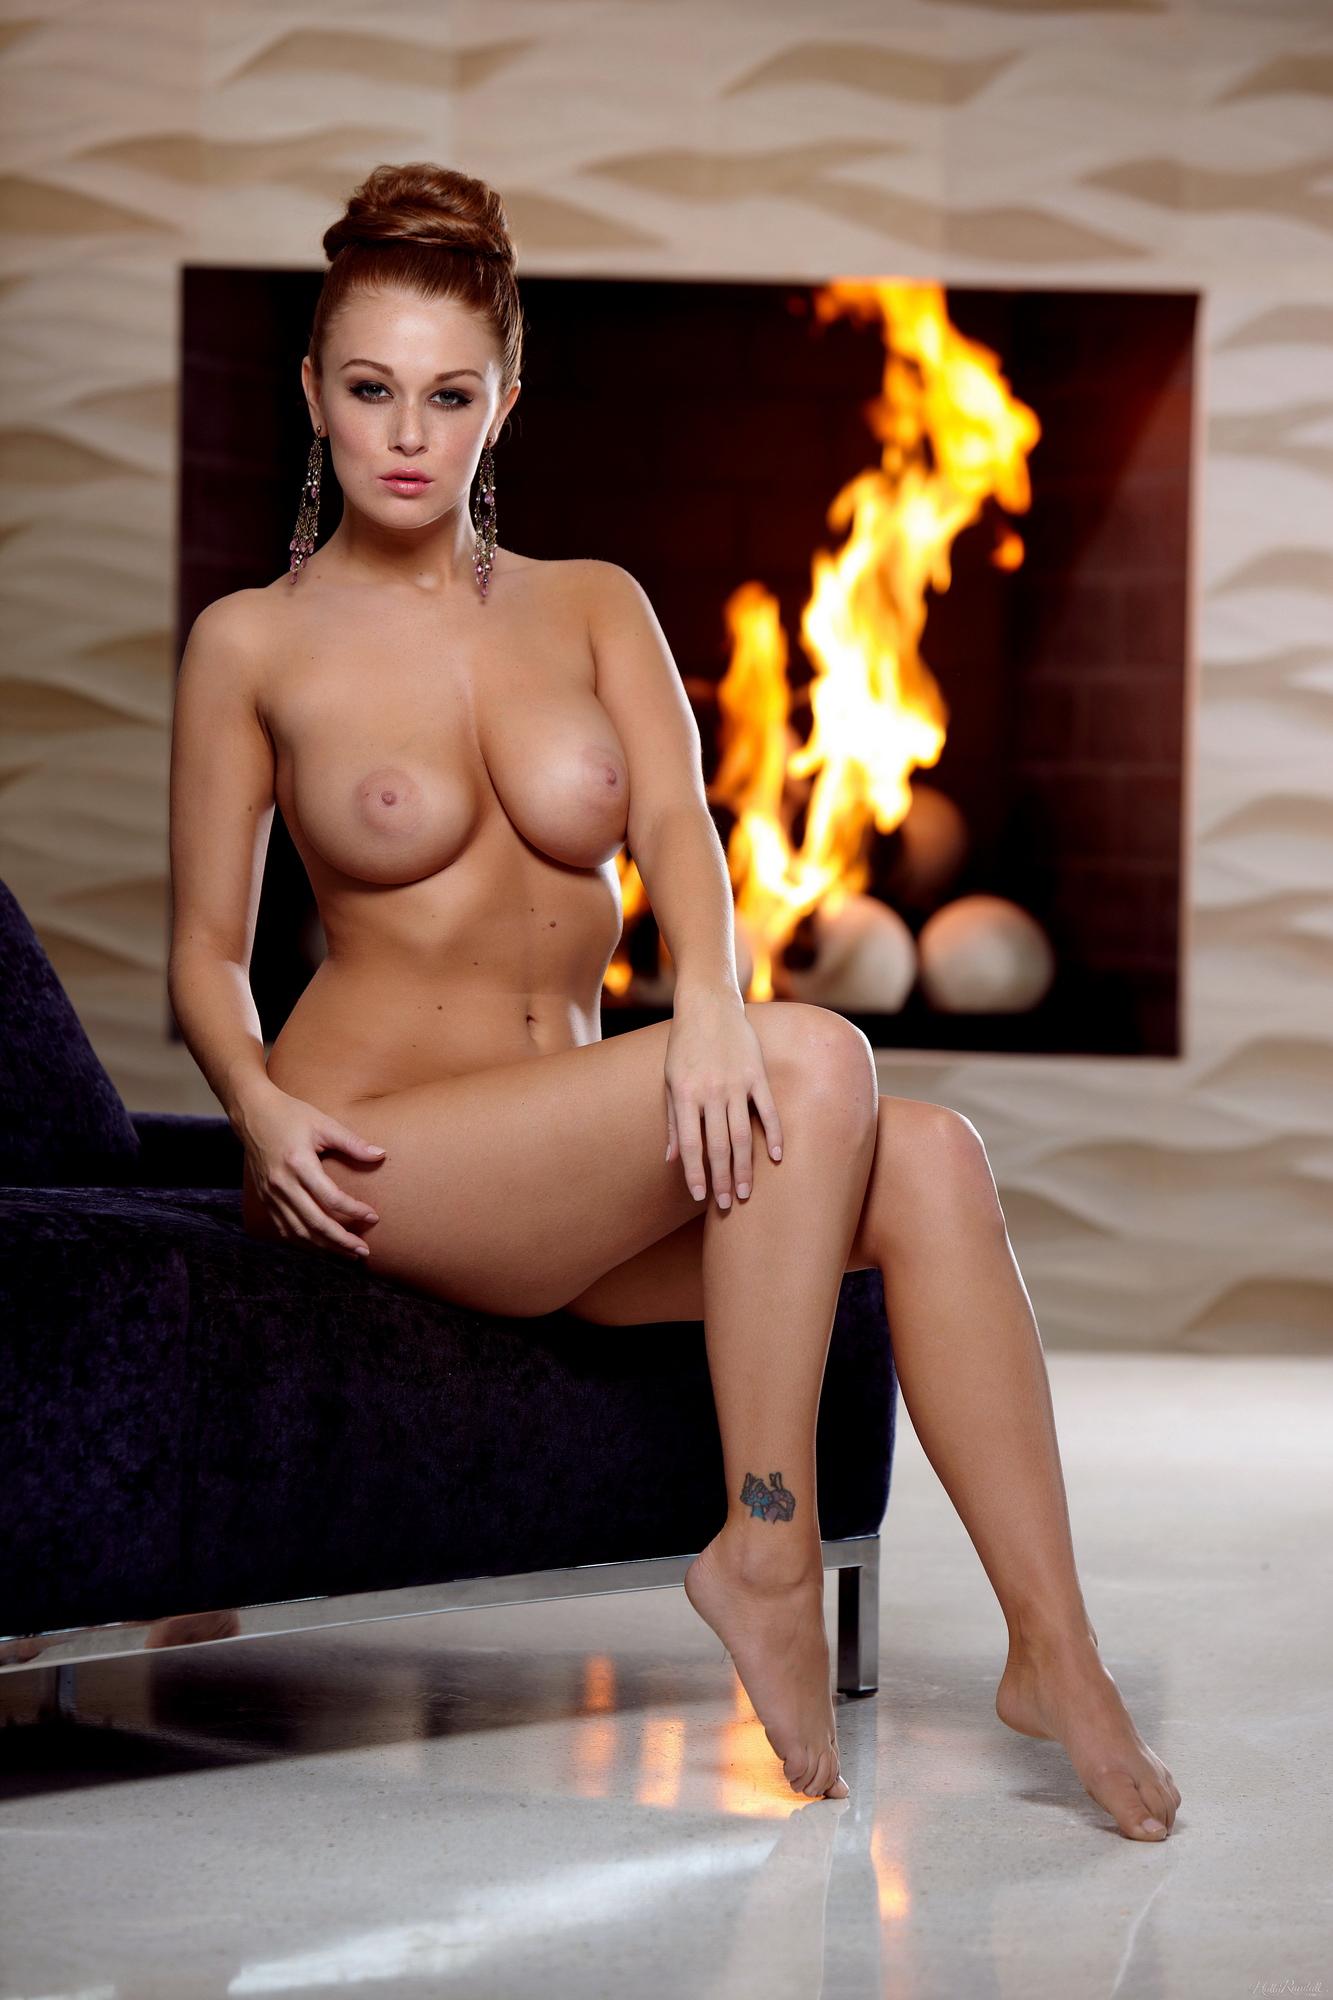 leanna-decker-nude-fireplace-redhead-hollyrandall-13